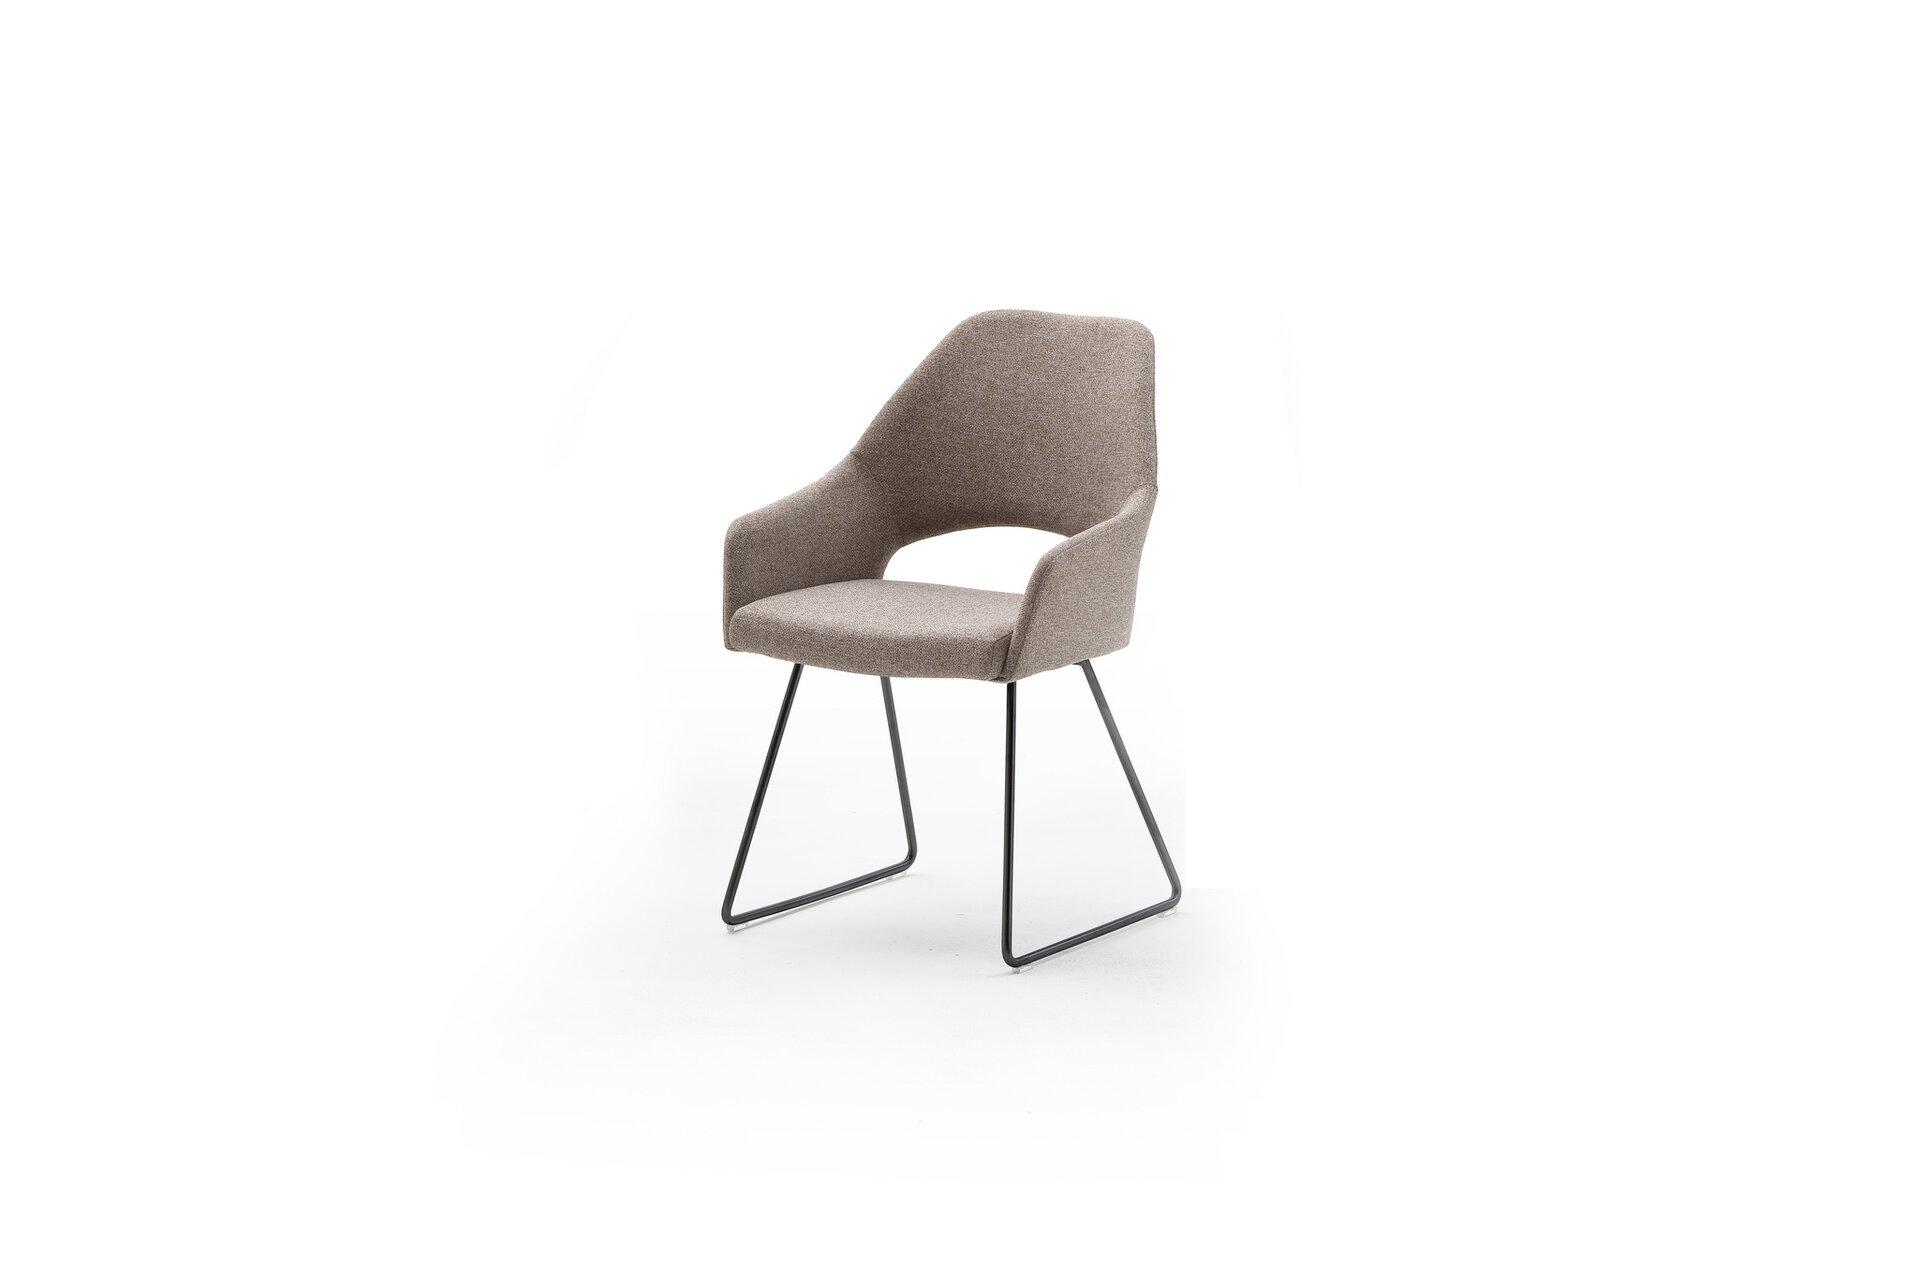 Stuhl ACTOR Vito Textil mehrfarbig 56 x 87 x 61 cm